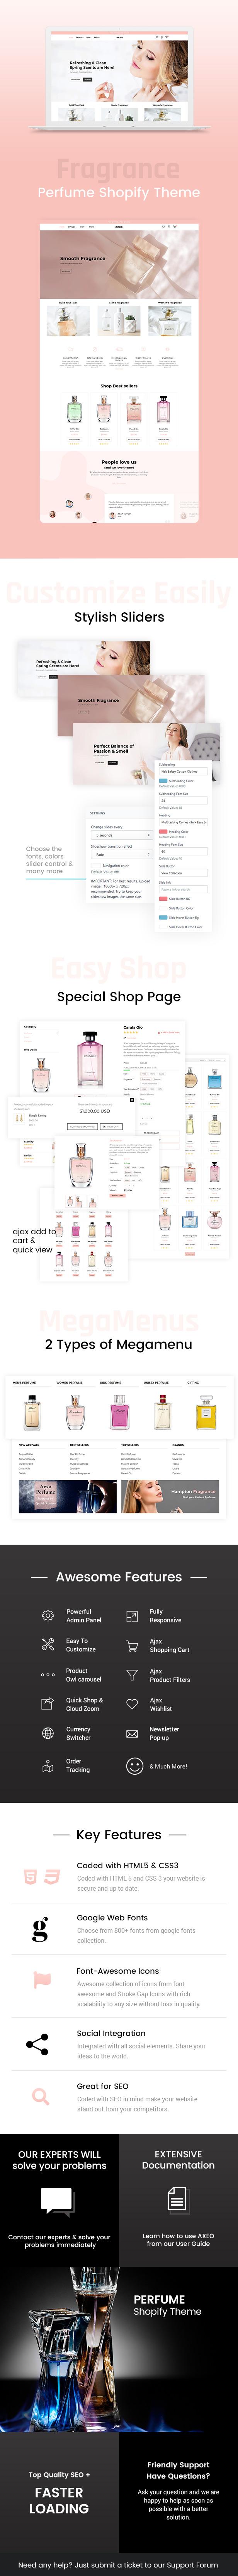 Axeo - Perfume, Cosmetics Store Shopify Theme - 1